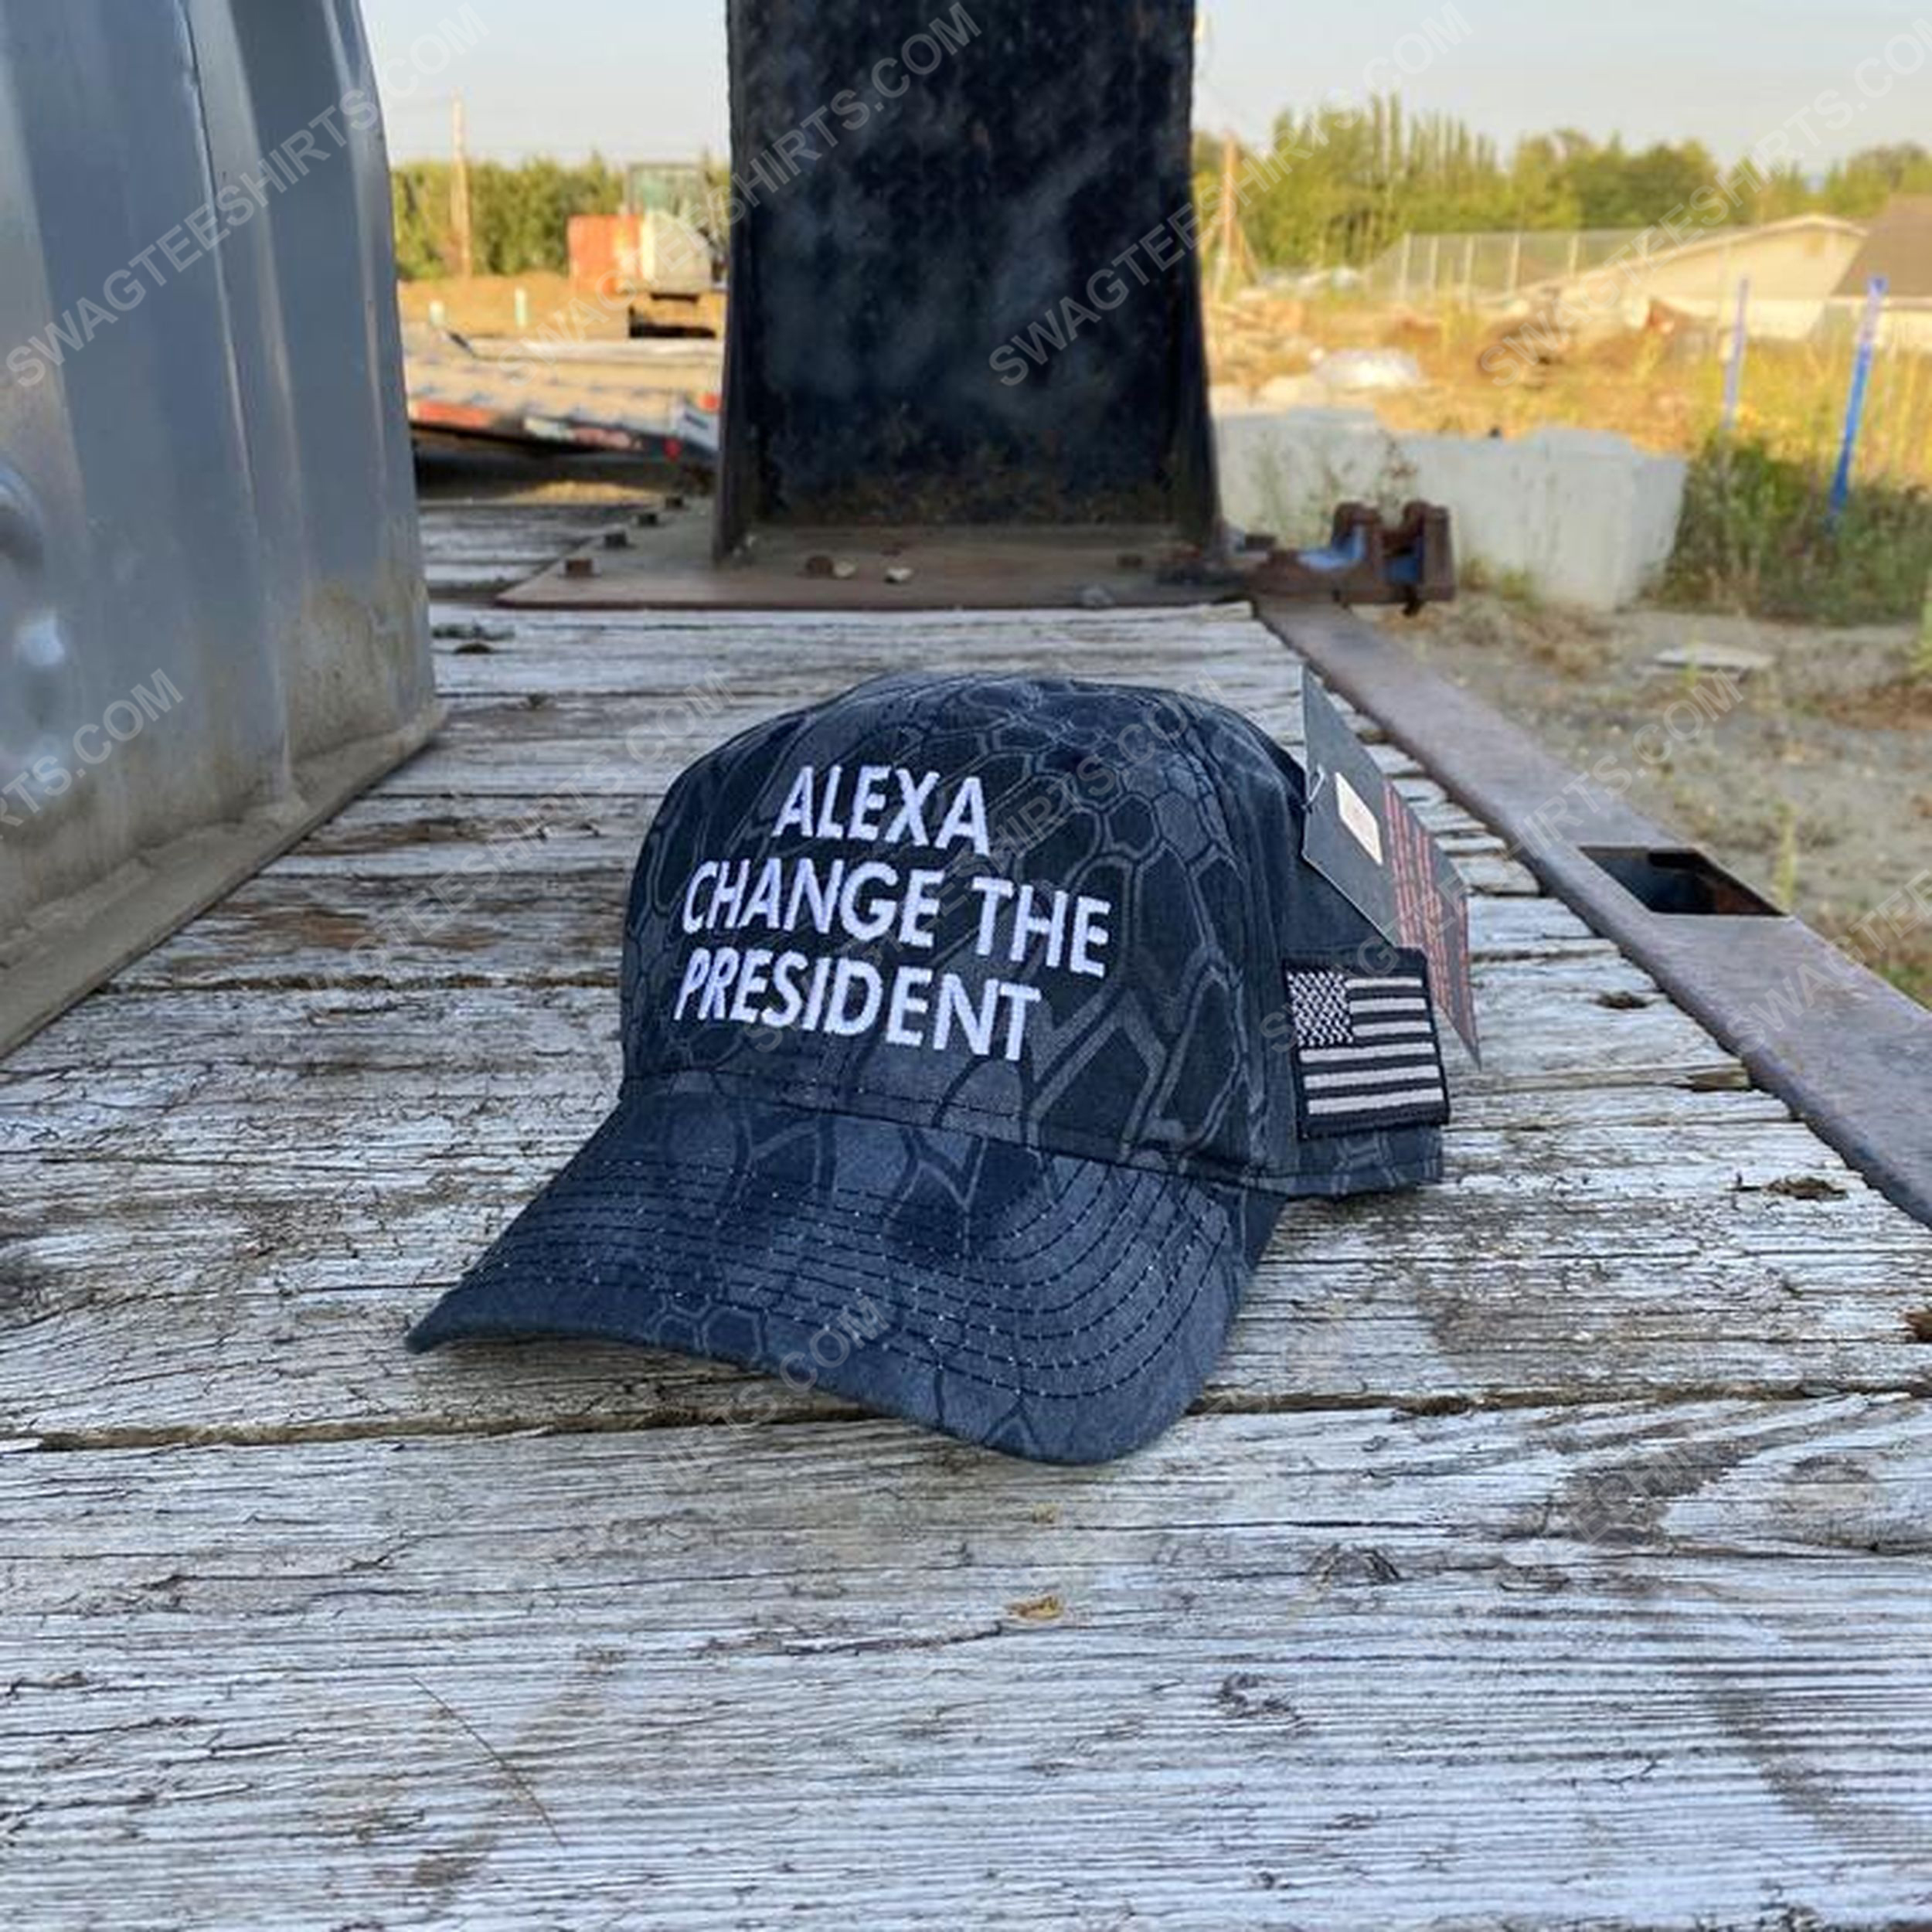 Alexa change the president full print classic hat 1 - Copy (2)